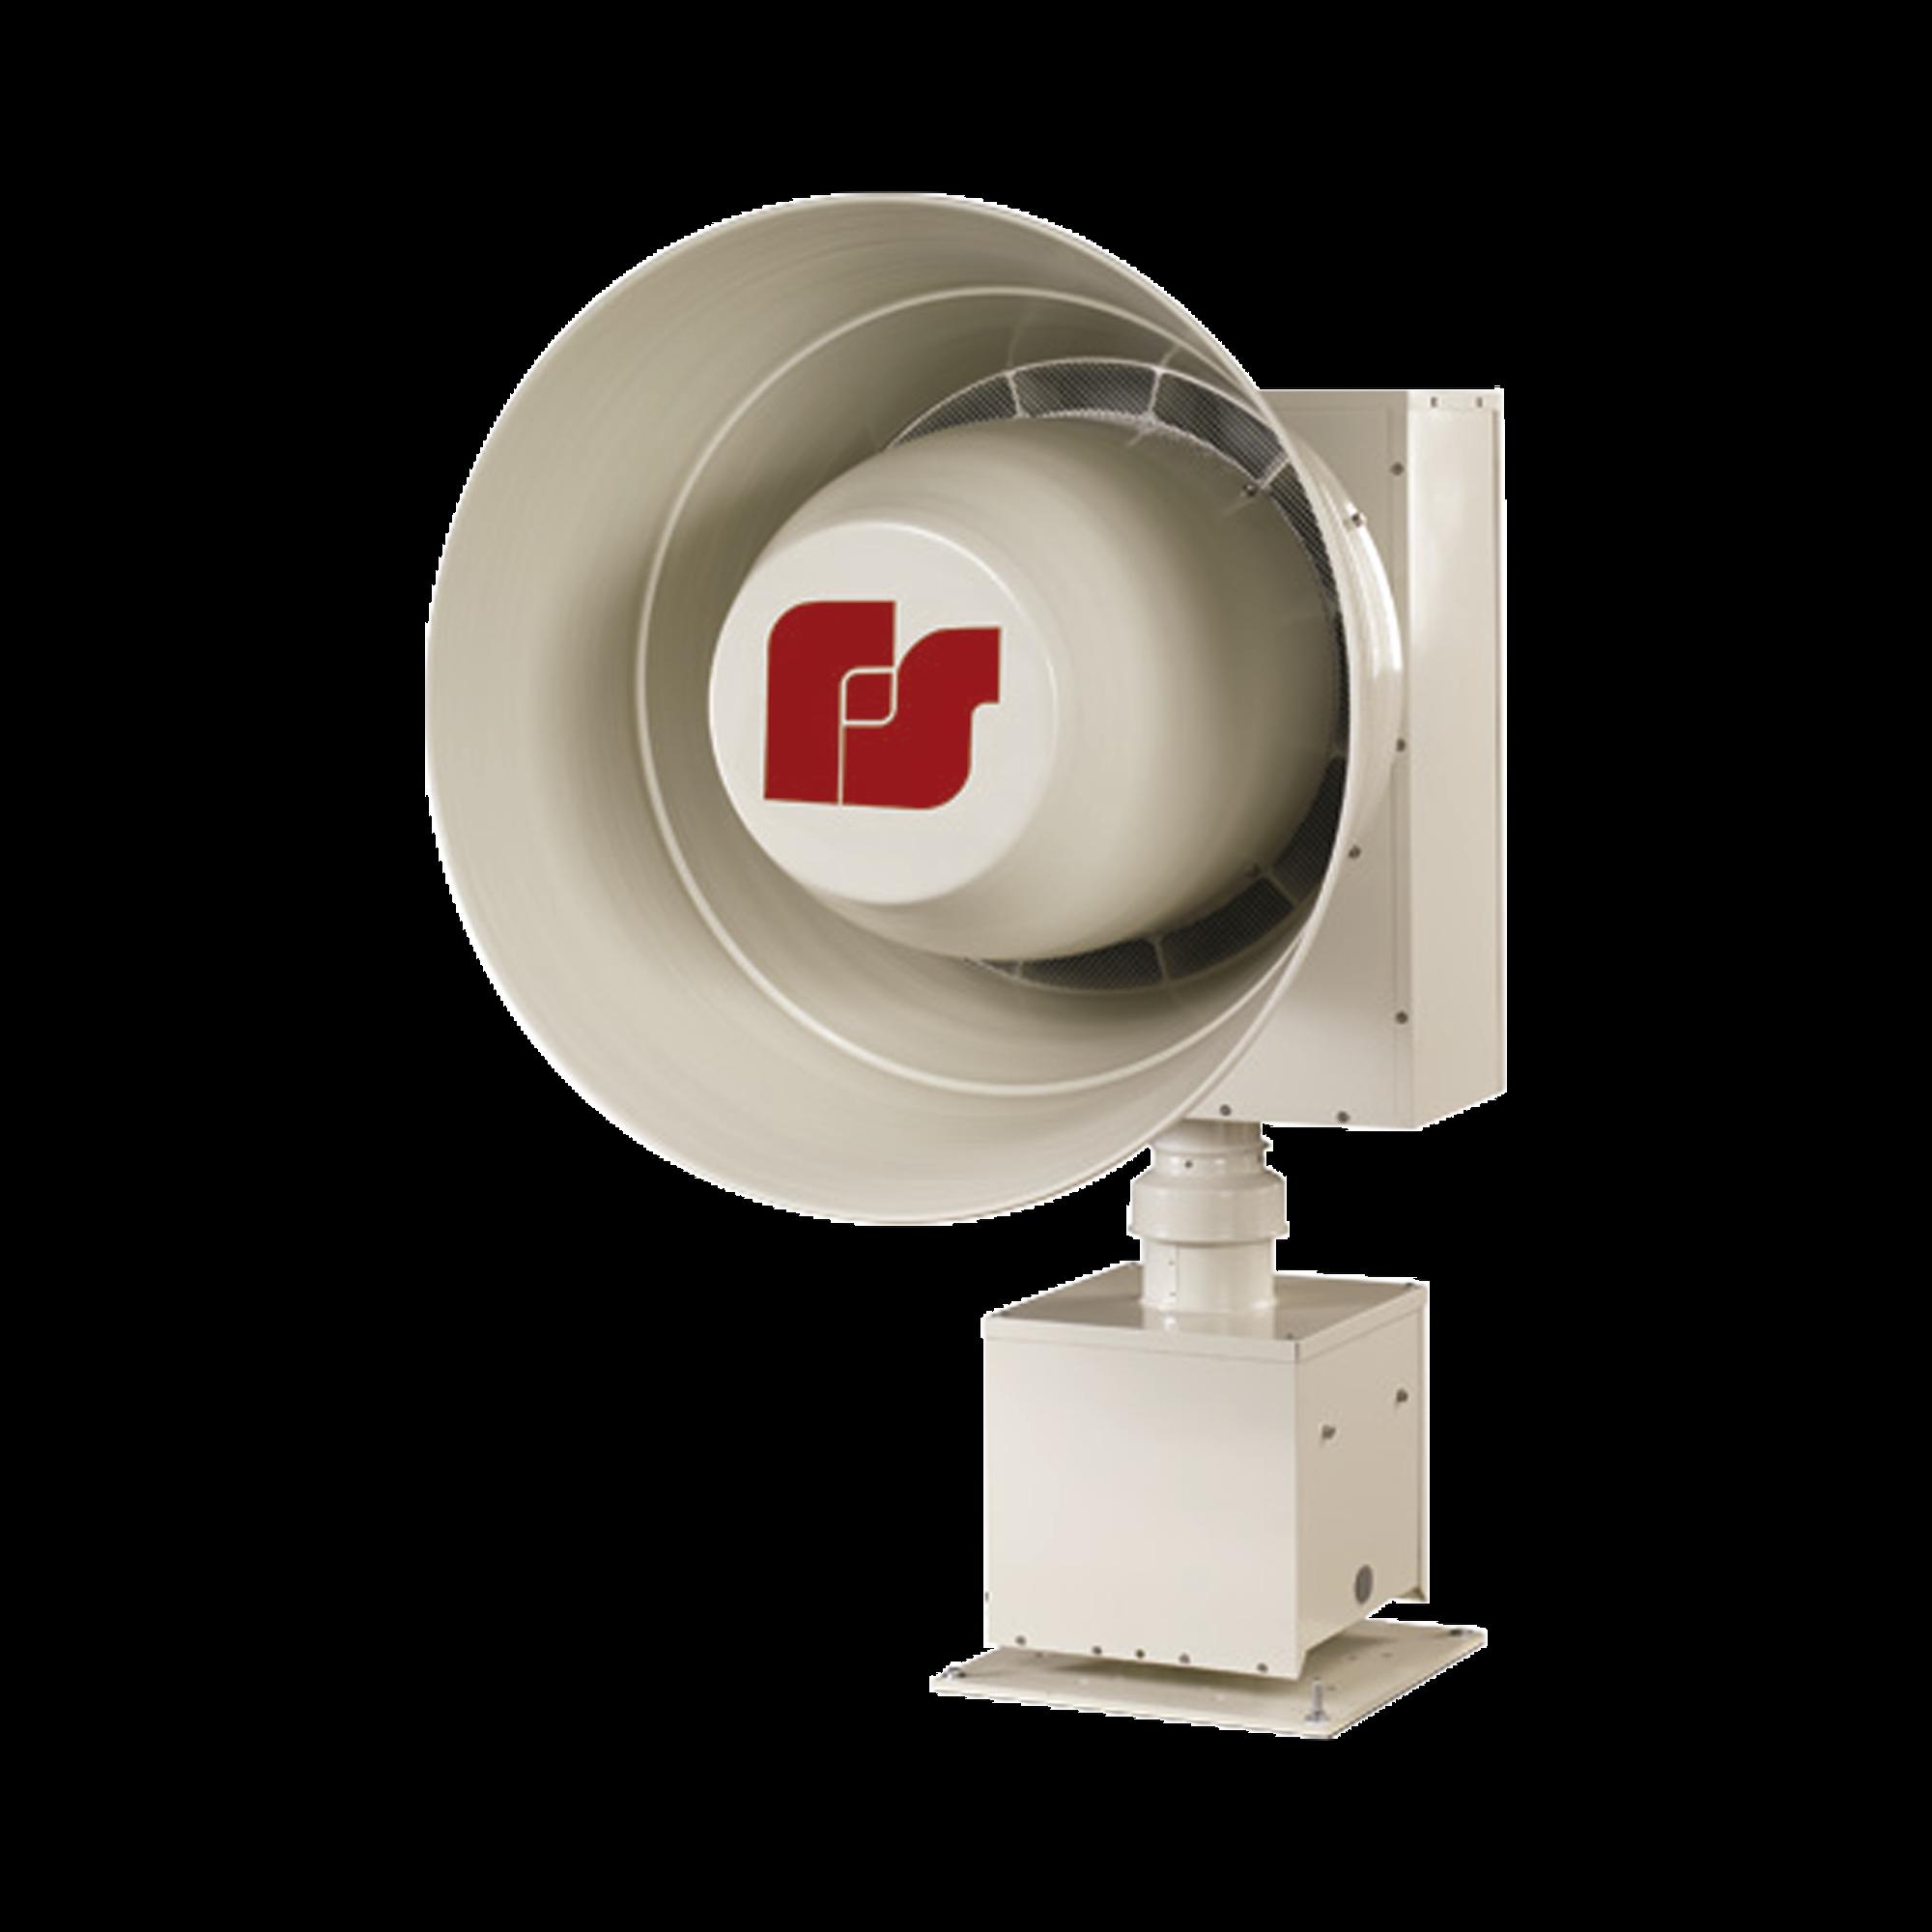 Sirena rotativa de alta potencia electromecanica, 130db, 800hz